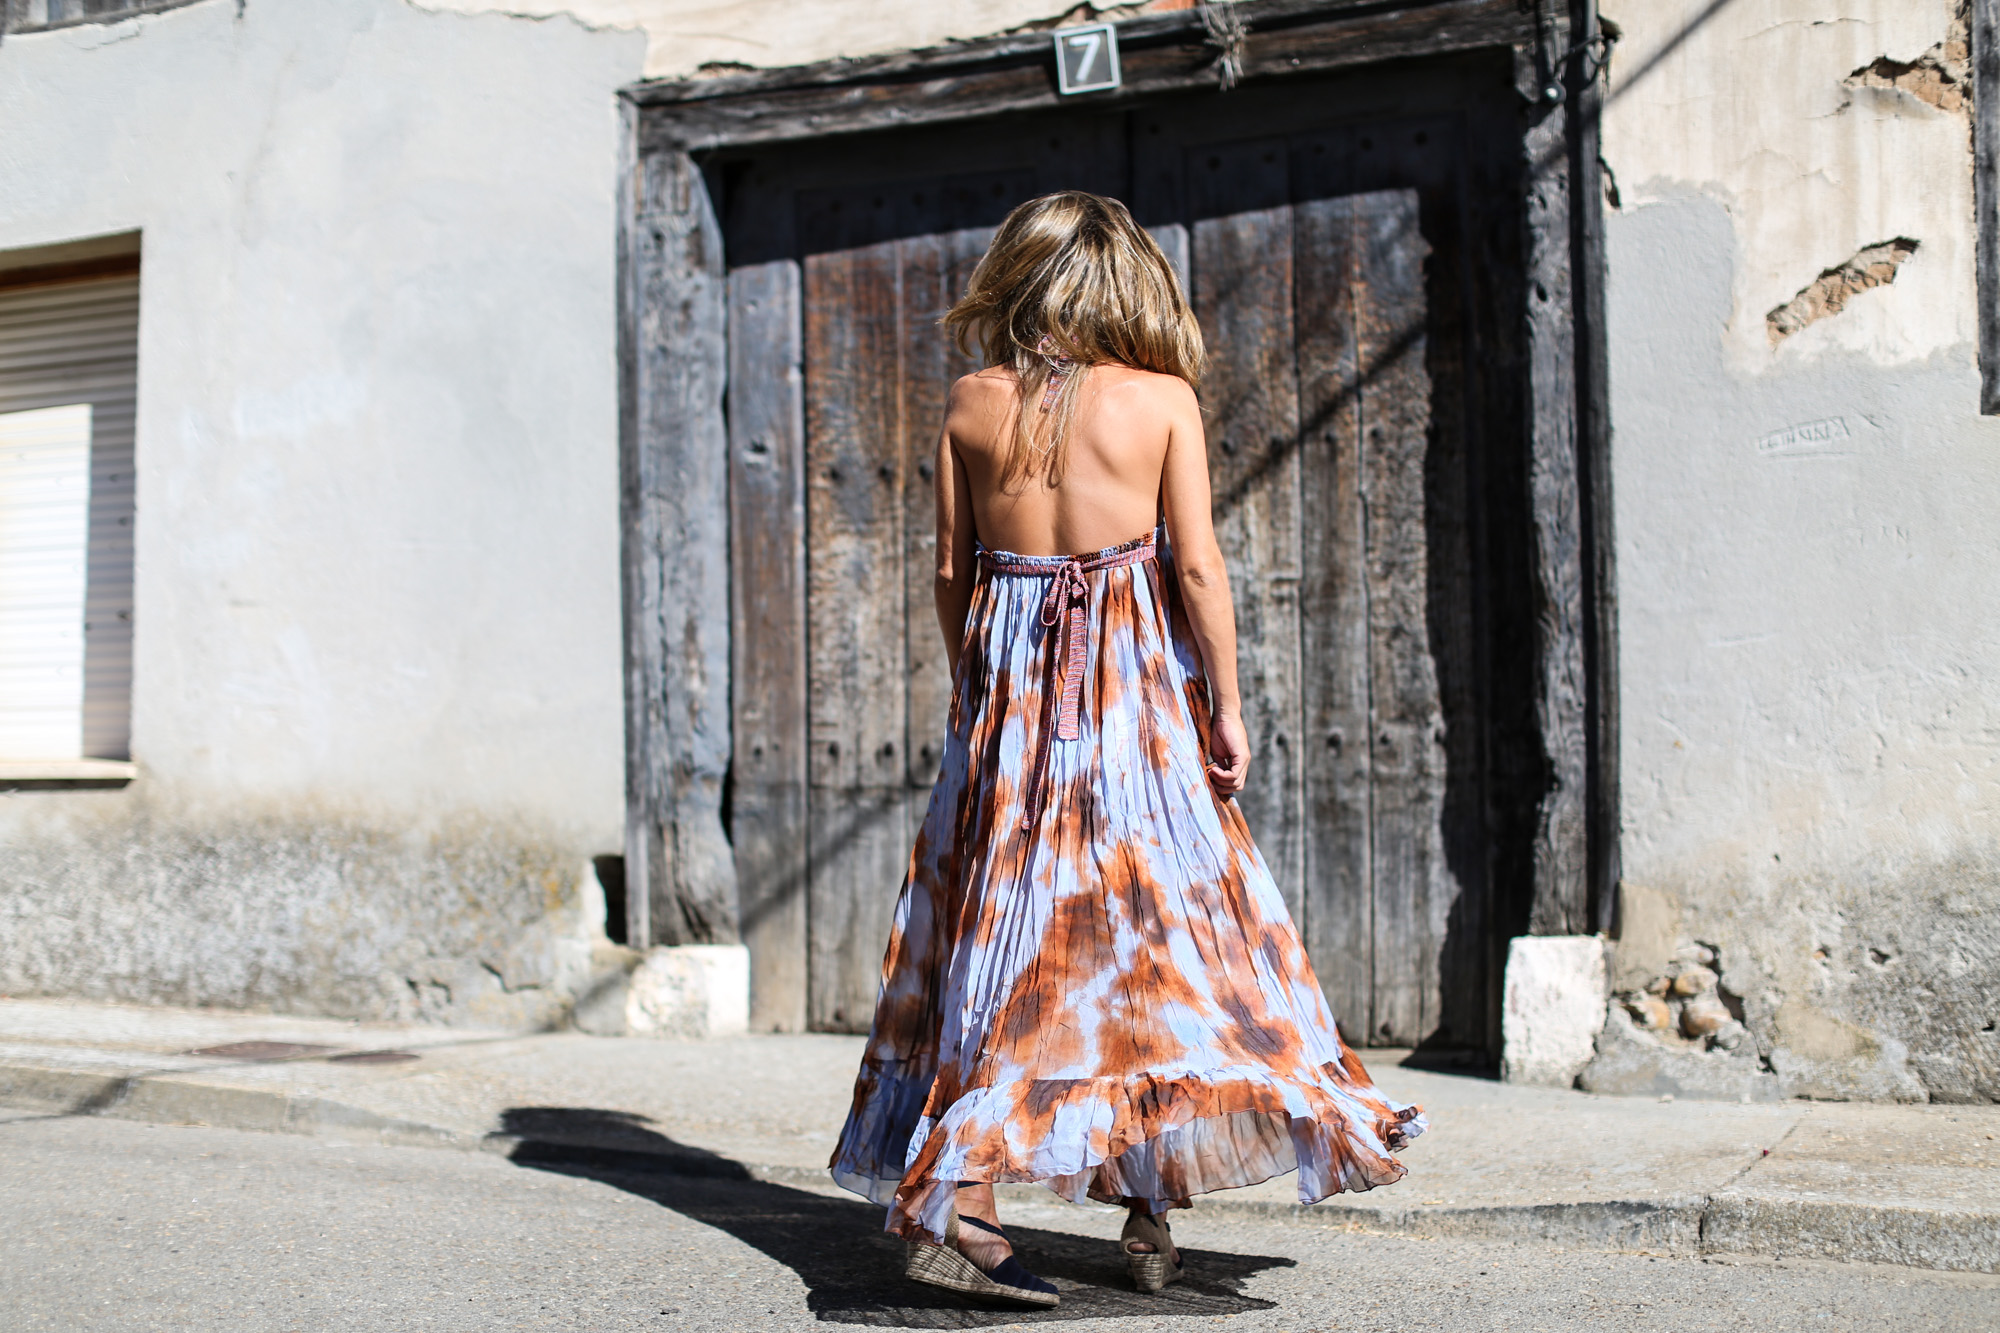 clochet_streetstyle_zara_boholongdress__pull&bear_flamingo_oversized_denimjacket-2